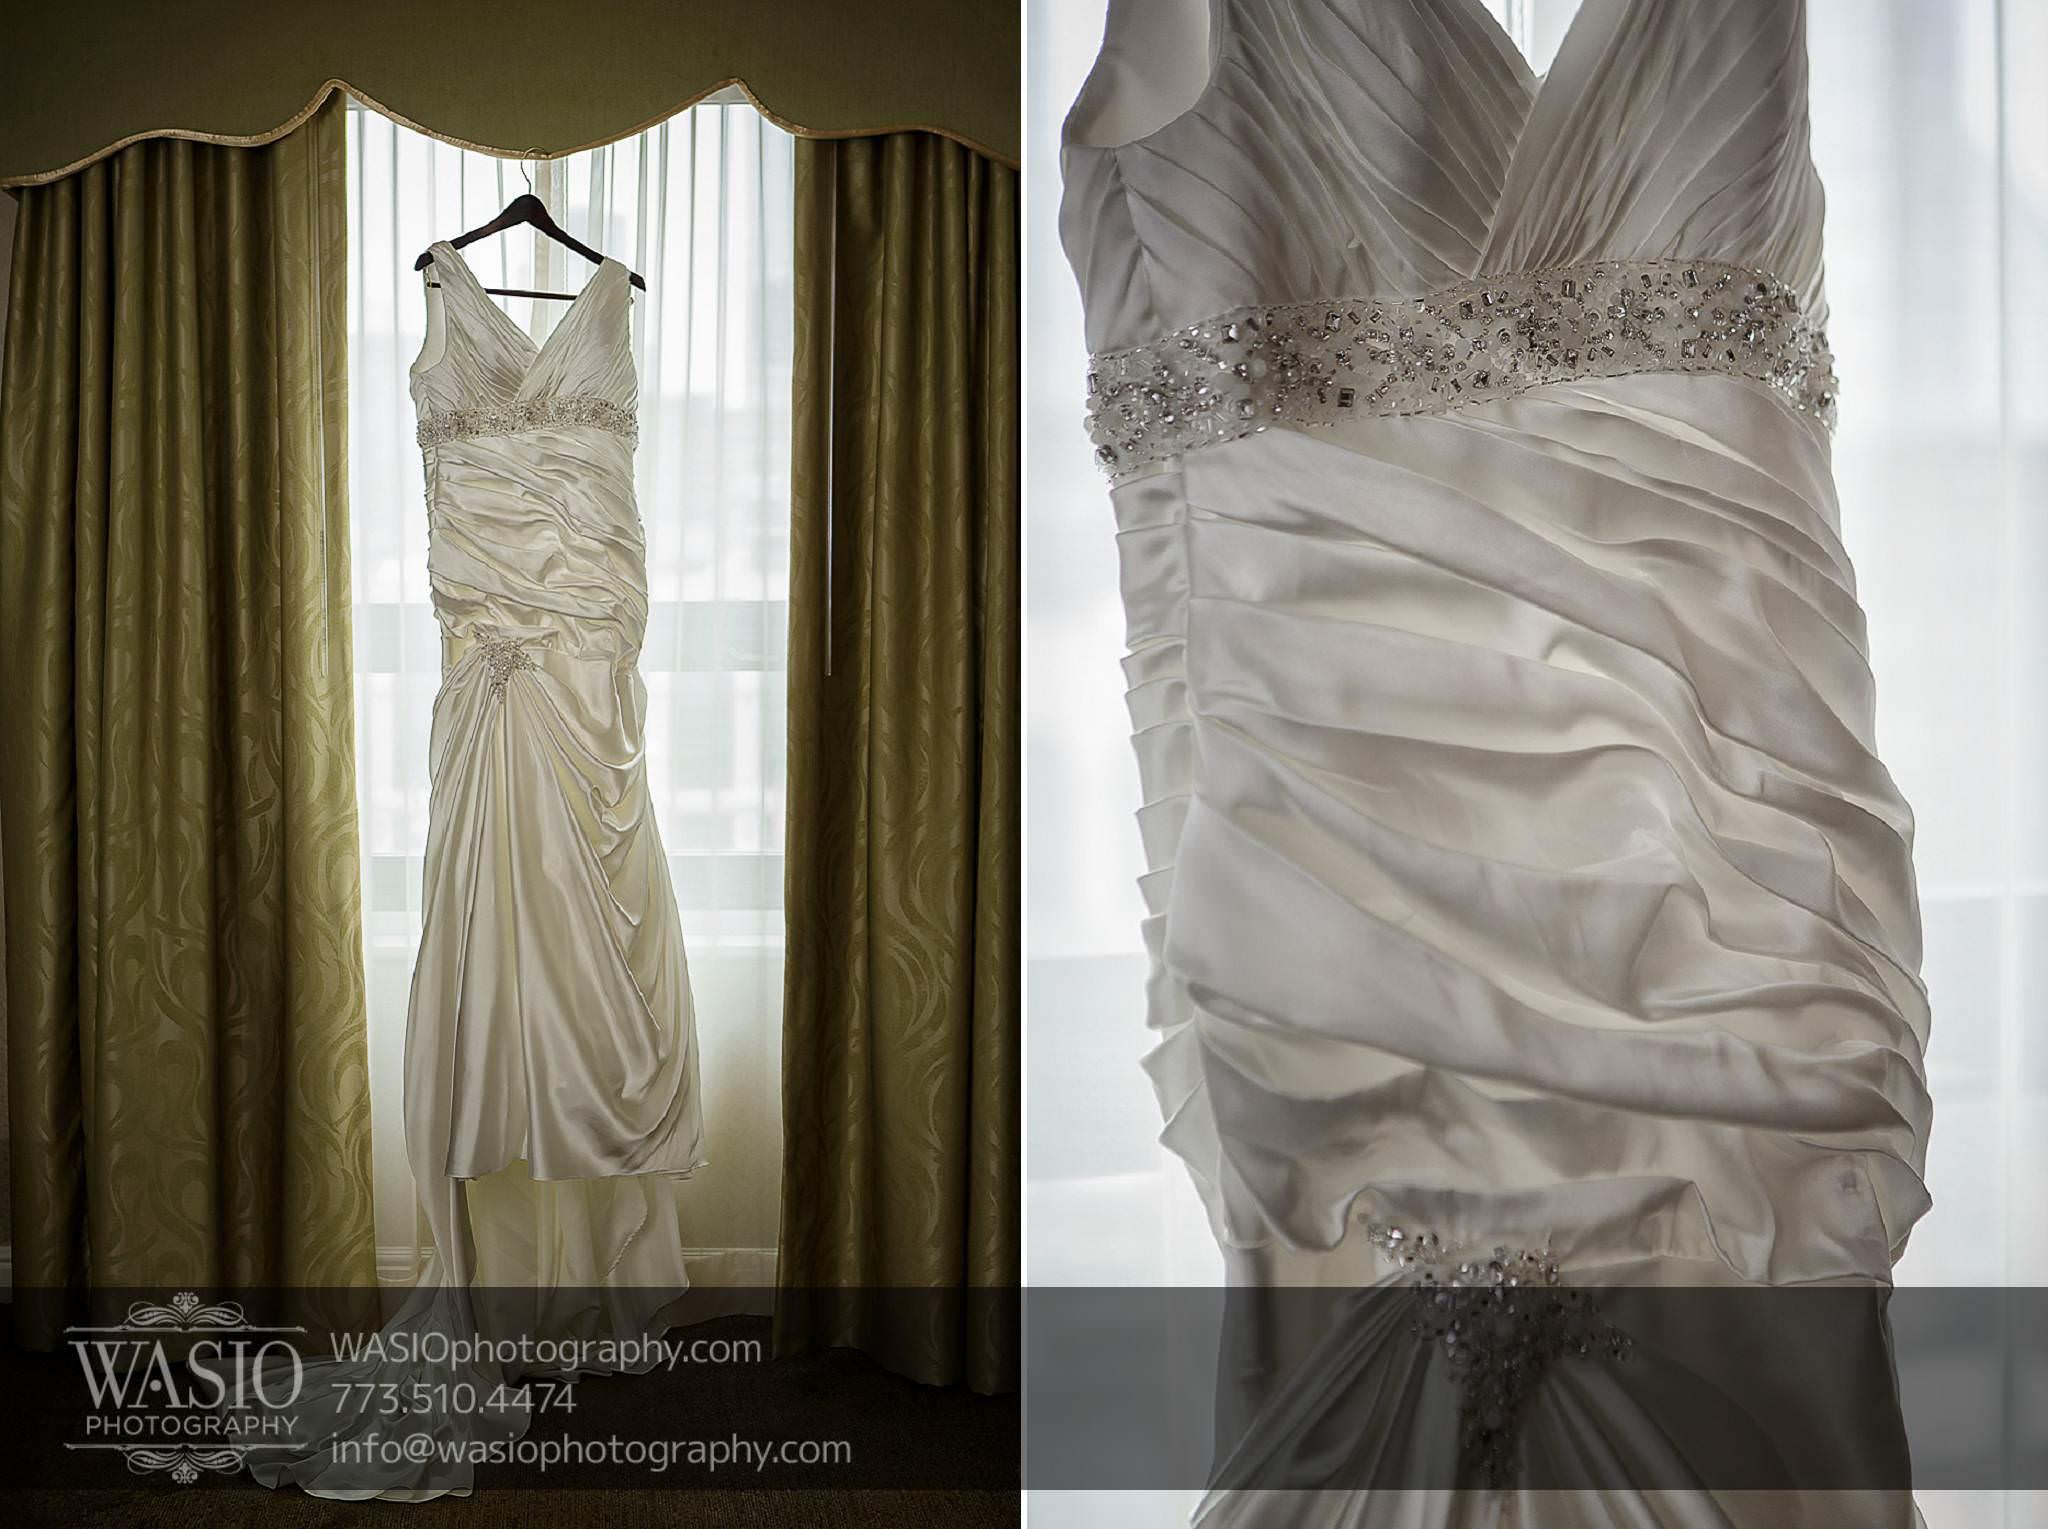 Chicago-wedding-photos-Palmer-House-wedding-dress-mermaid-white-crystals-halter-033 Chicago Wedding Photos - Svetlana + Yuriy